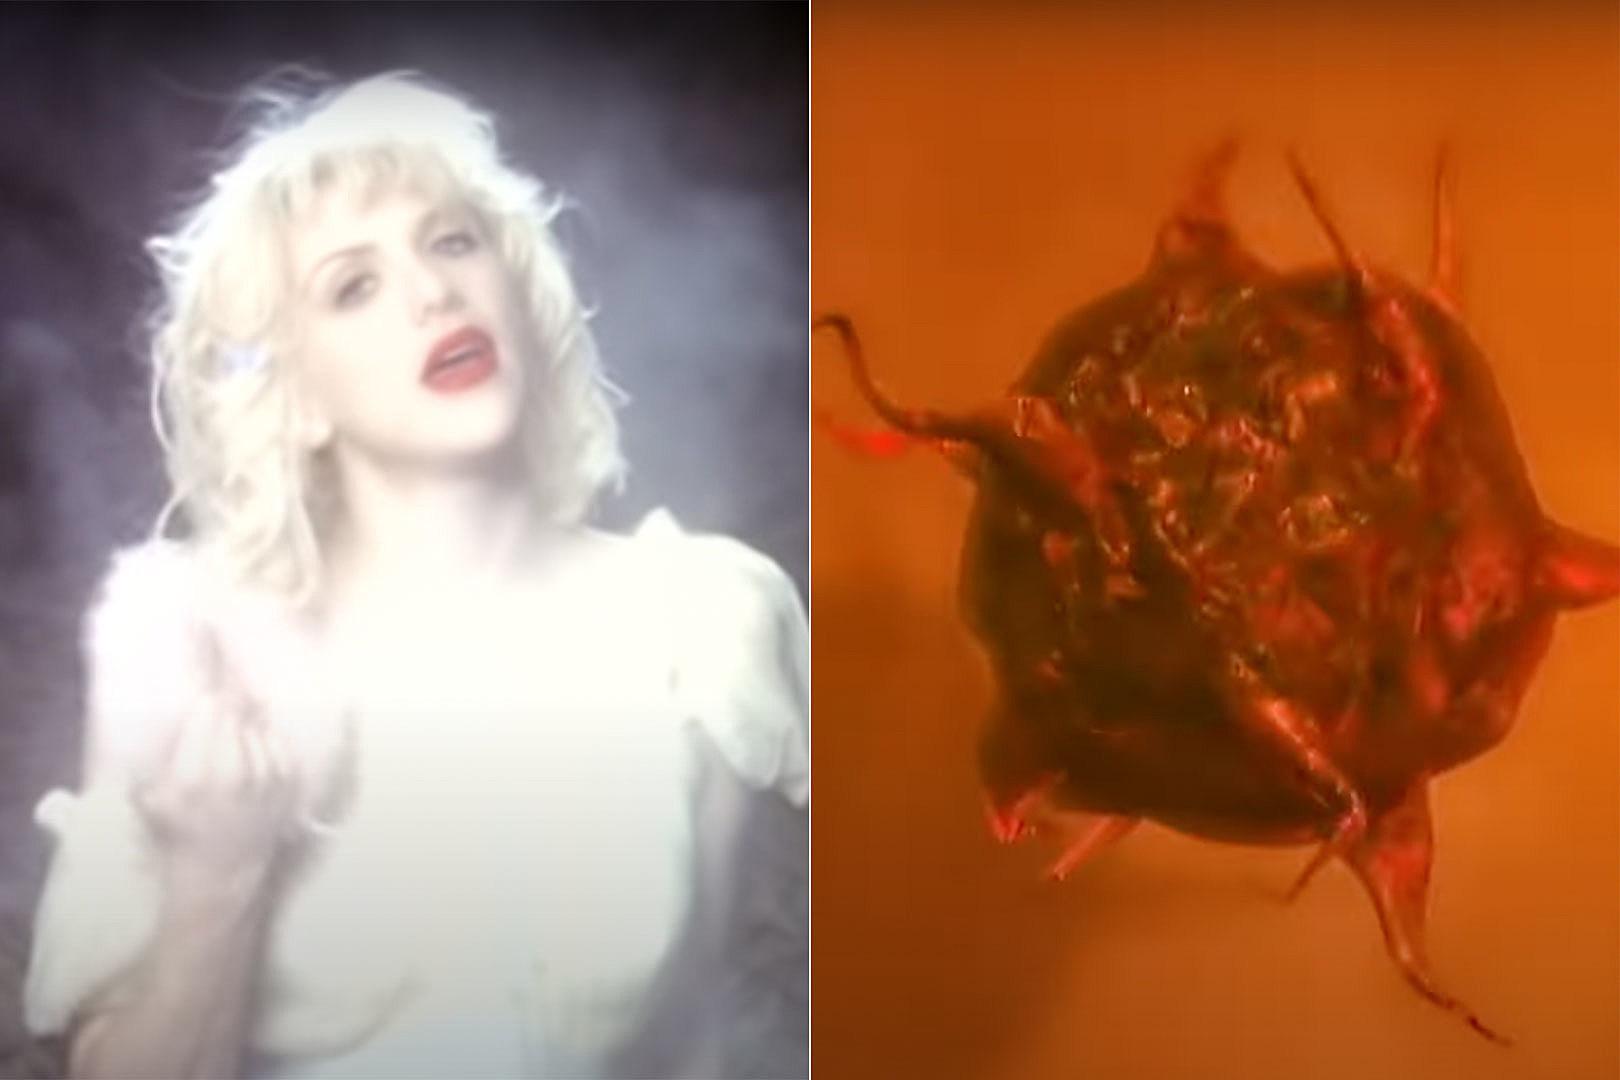 Director - 'I'll Stick Around' 'Menacing Ball' Was Courtney Love